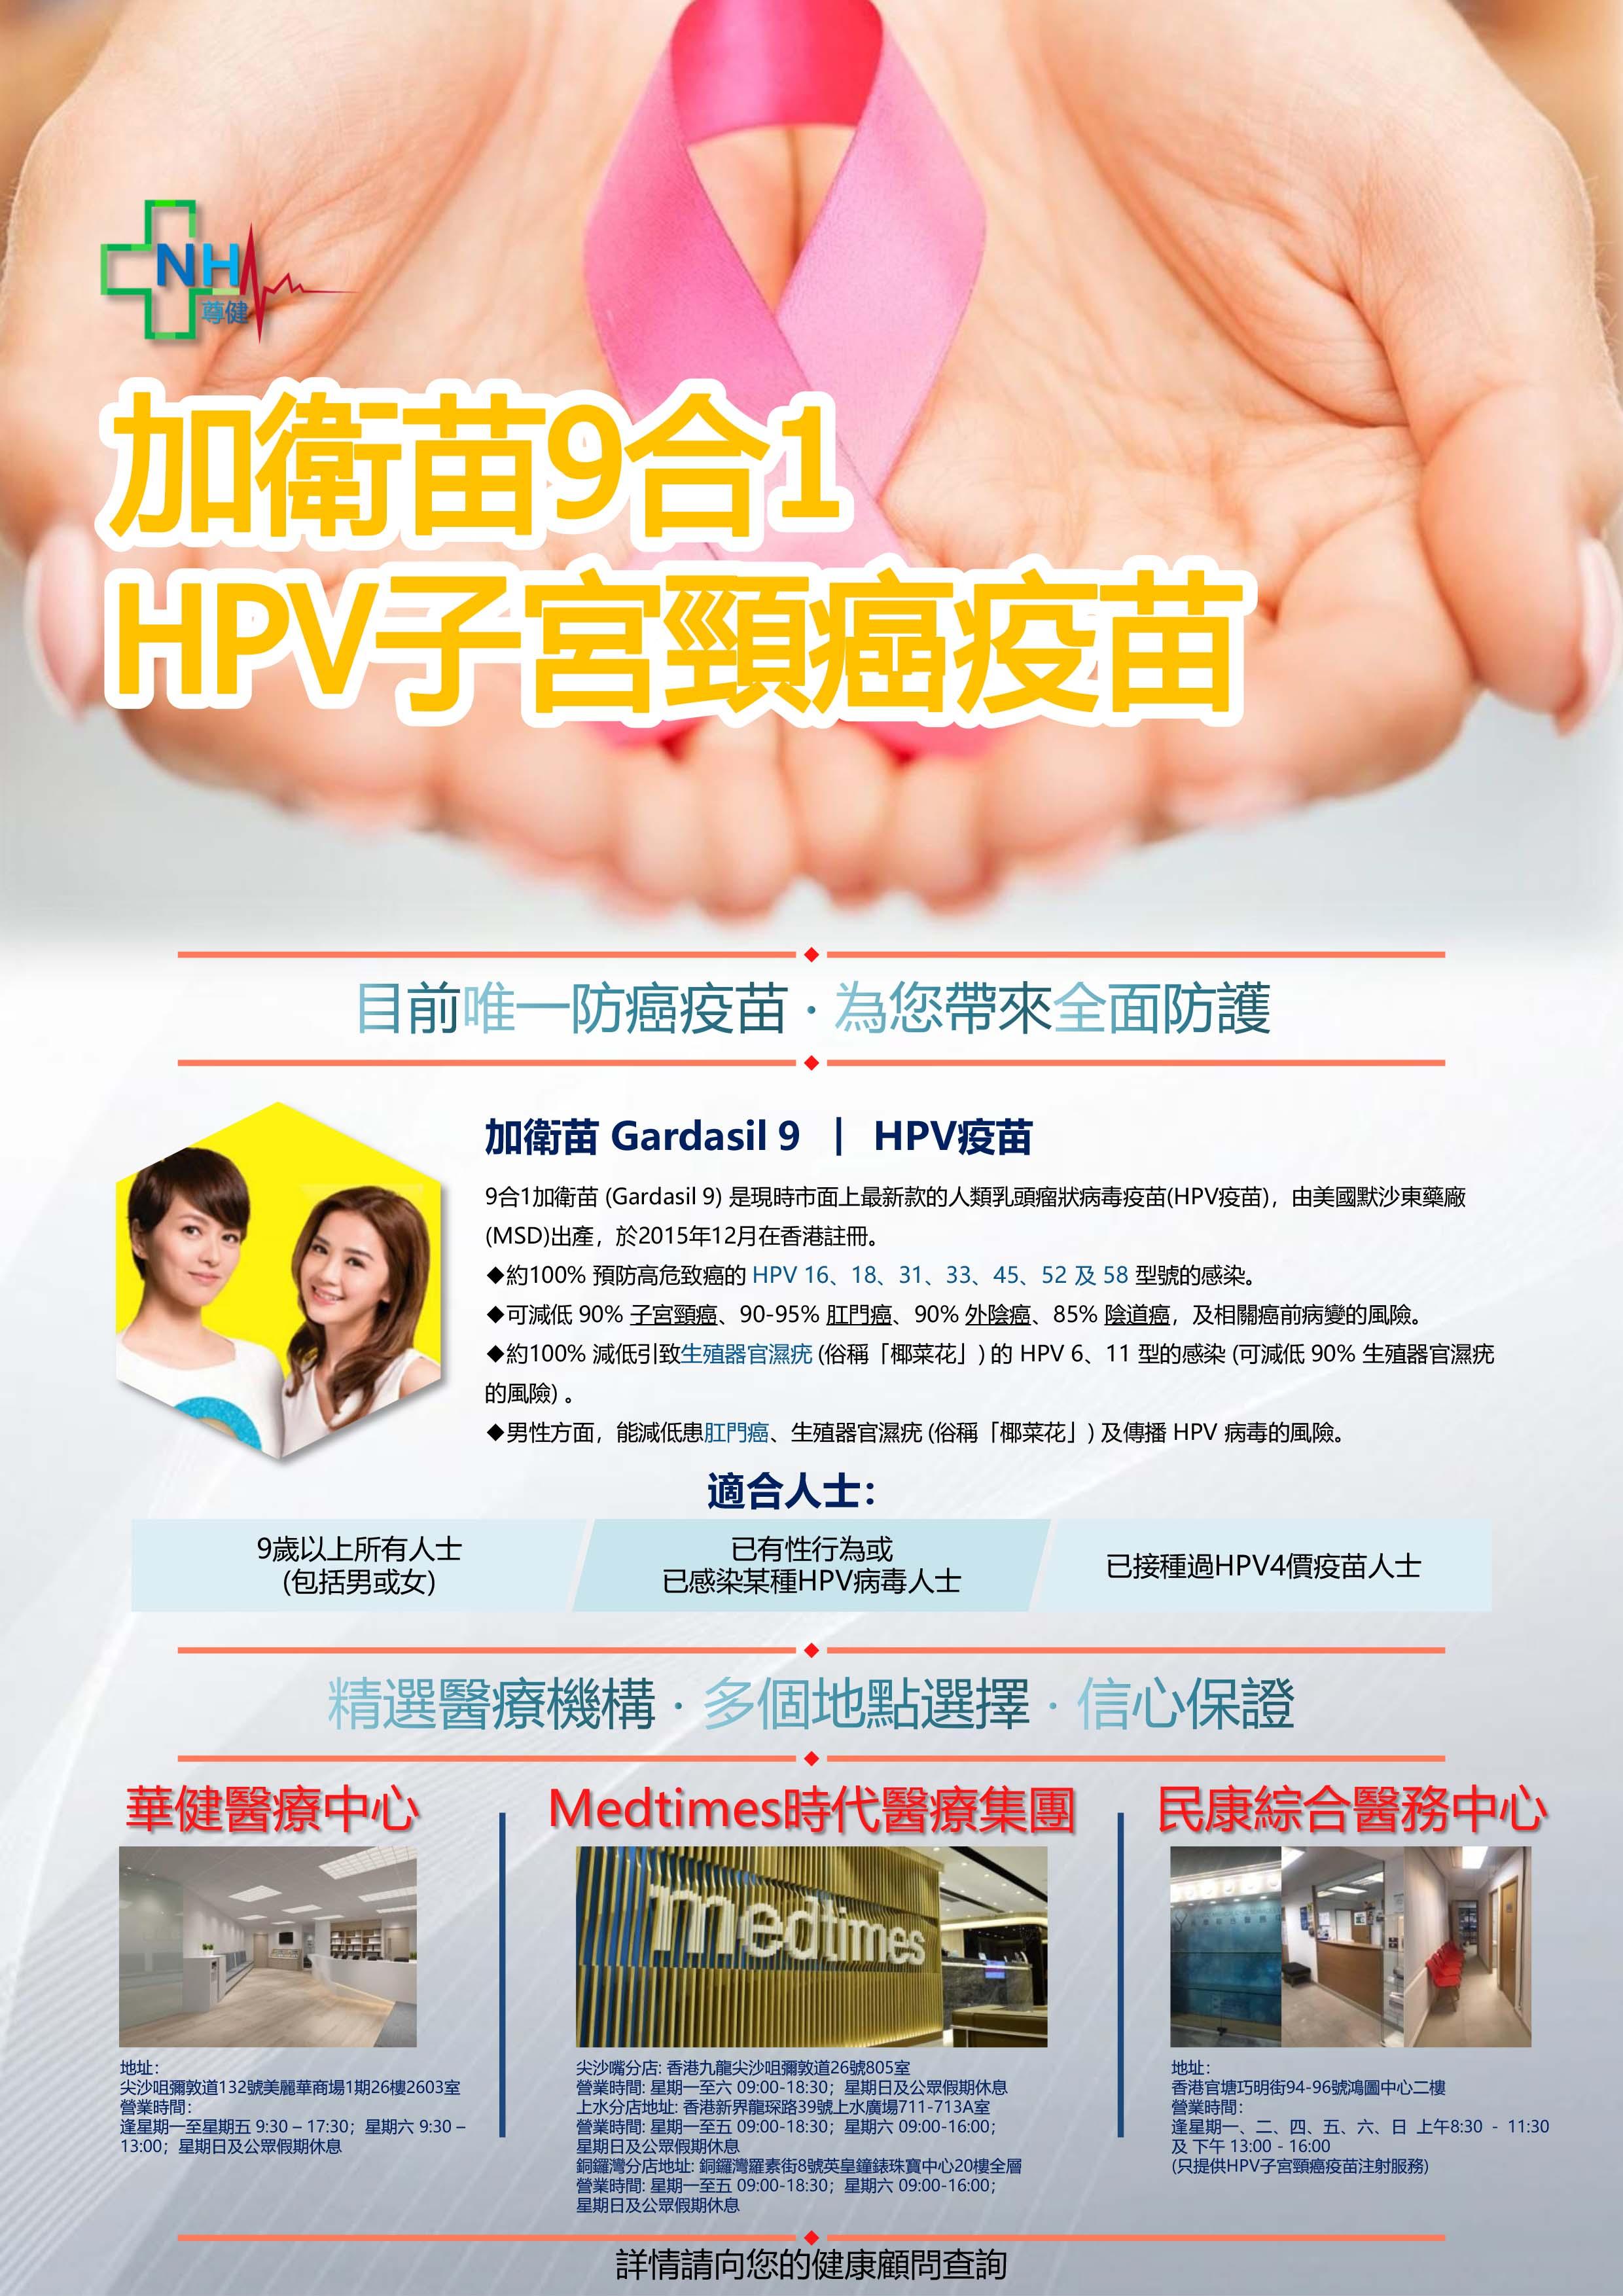 gardasil-9-hpv-vaccine.jpg